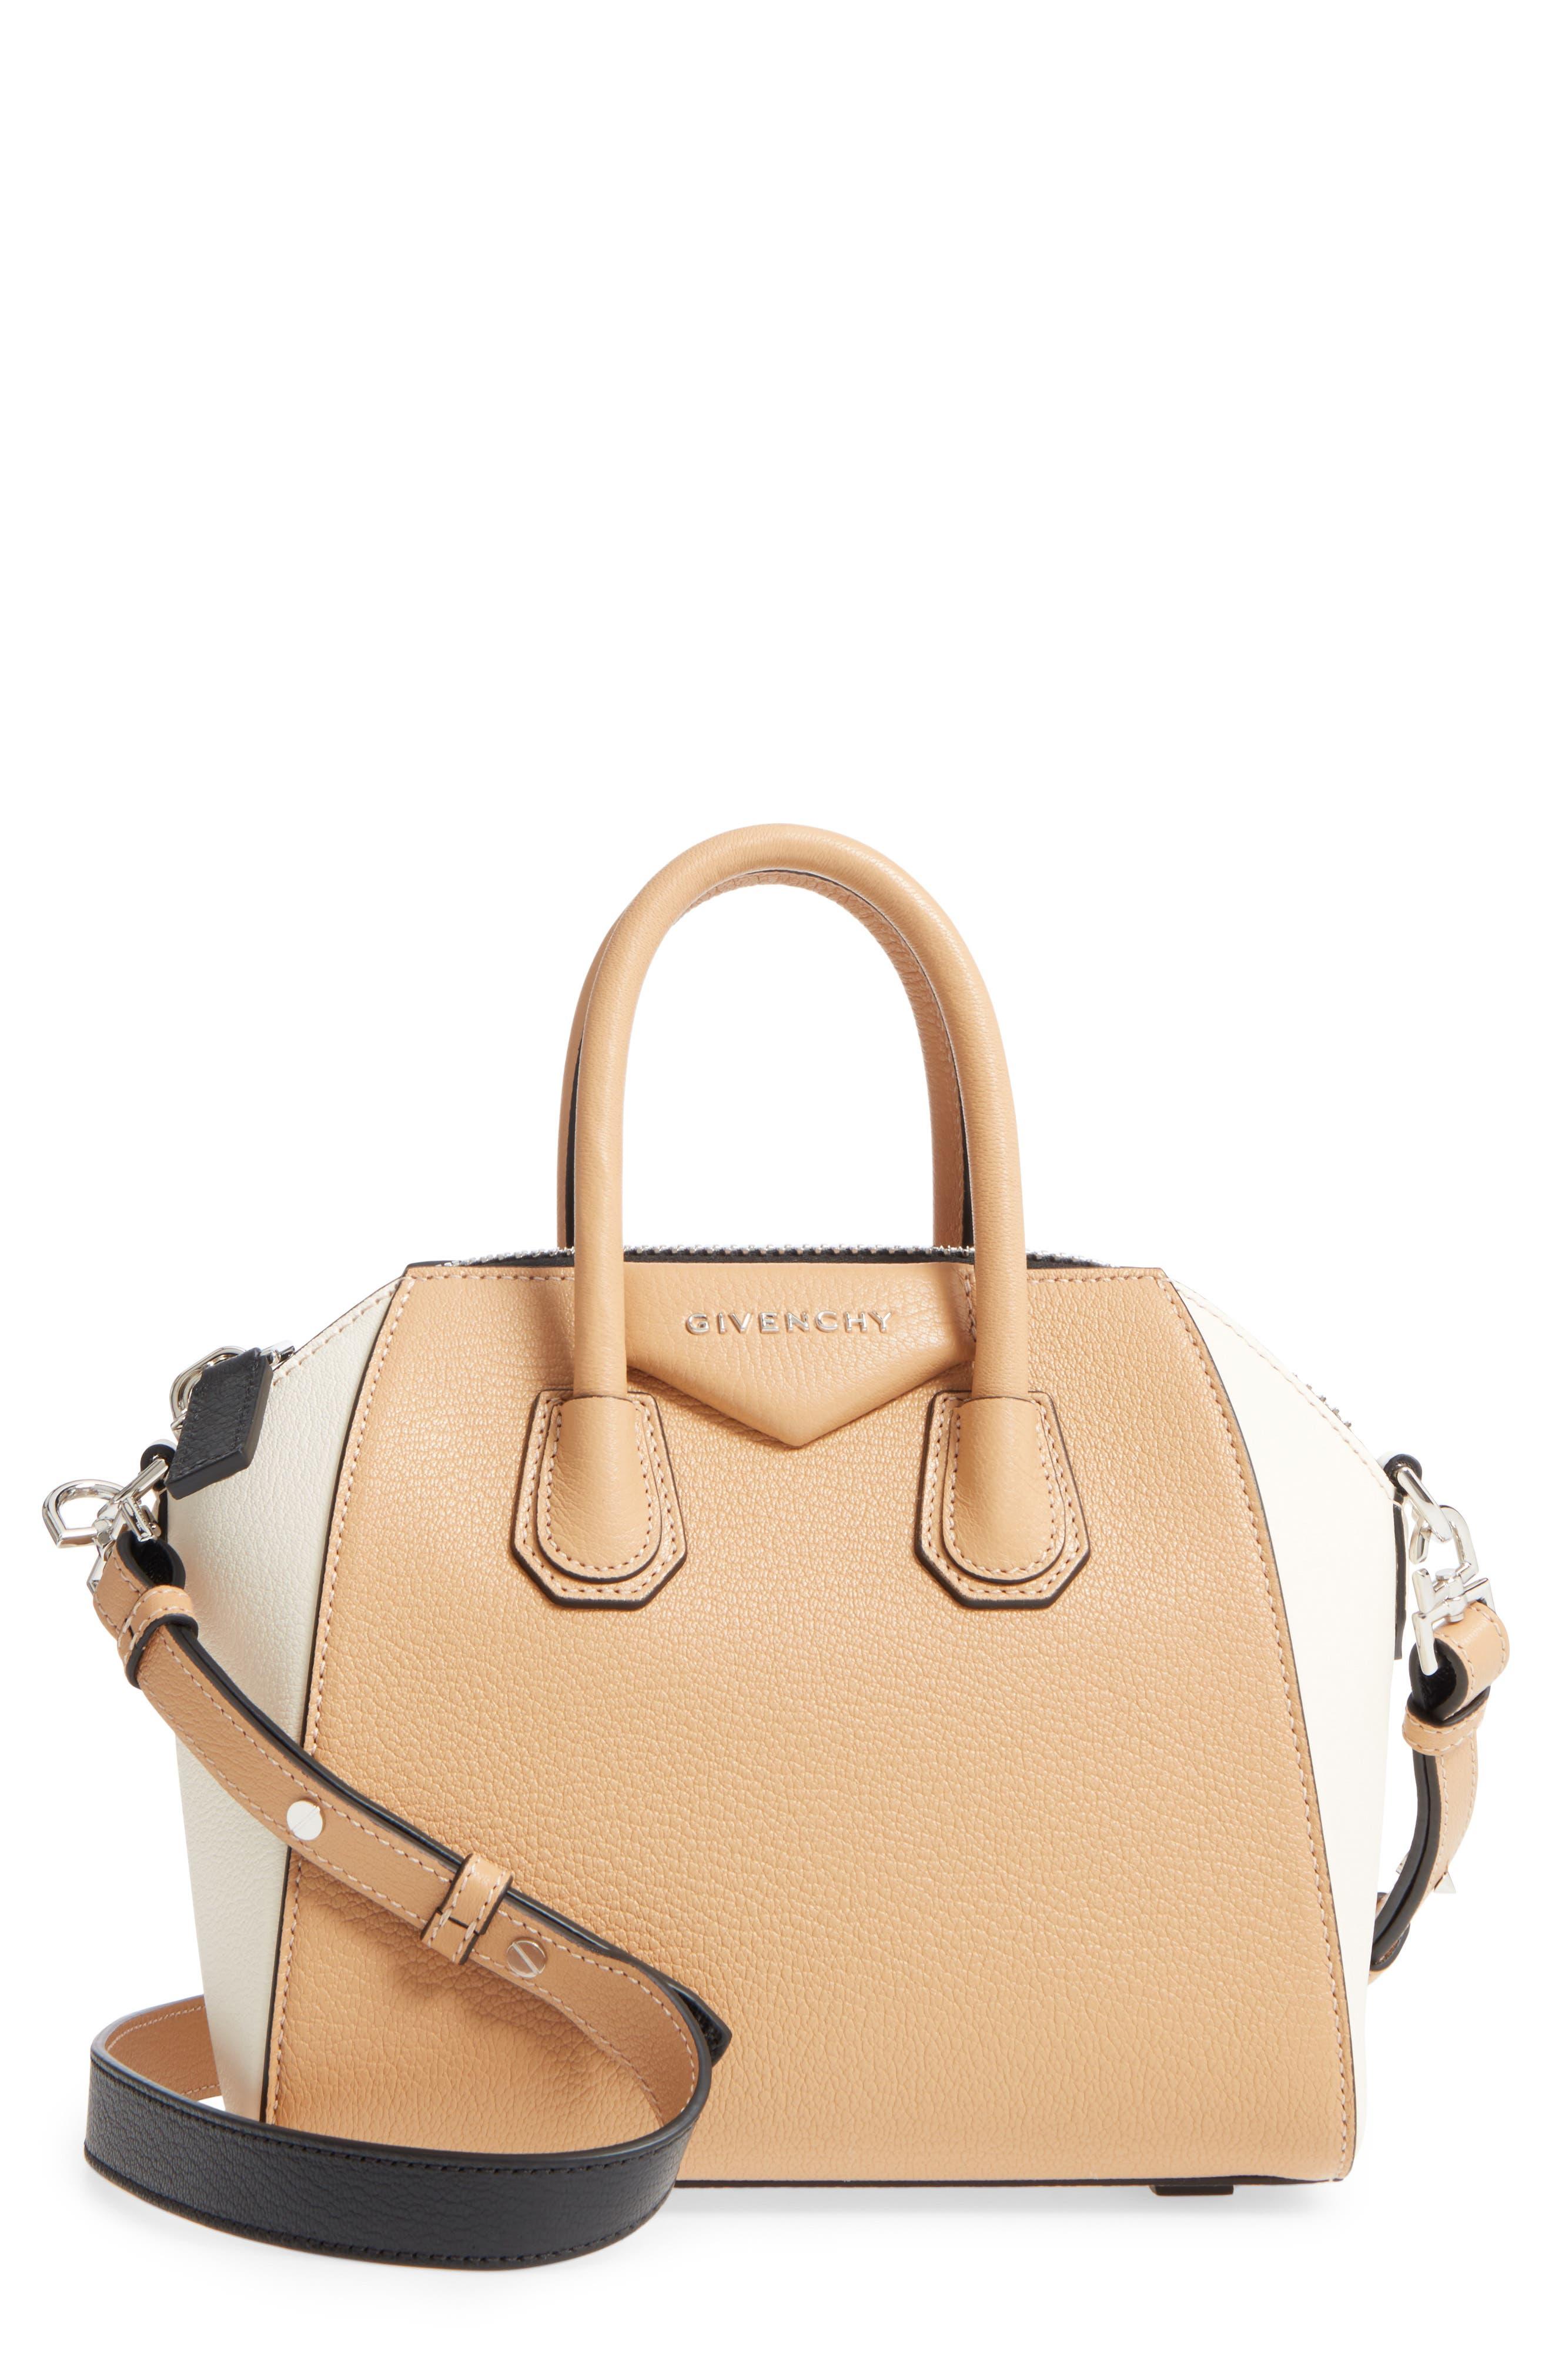 Main Image - Givenchy Mini Antigona Bicolor Sugar Leather Satchel